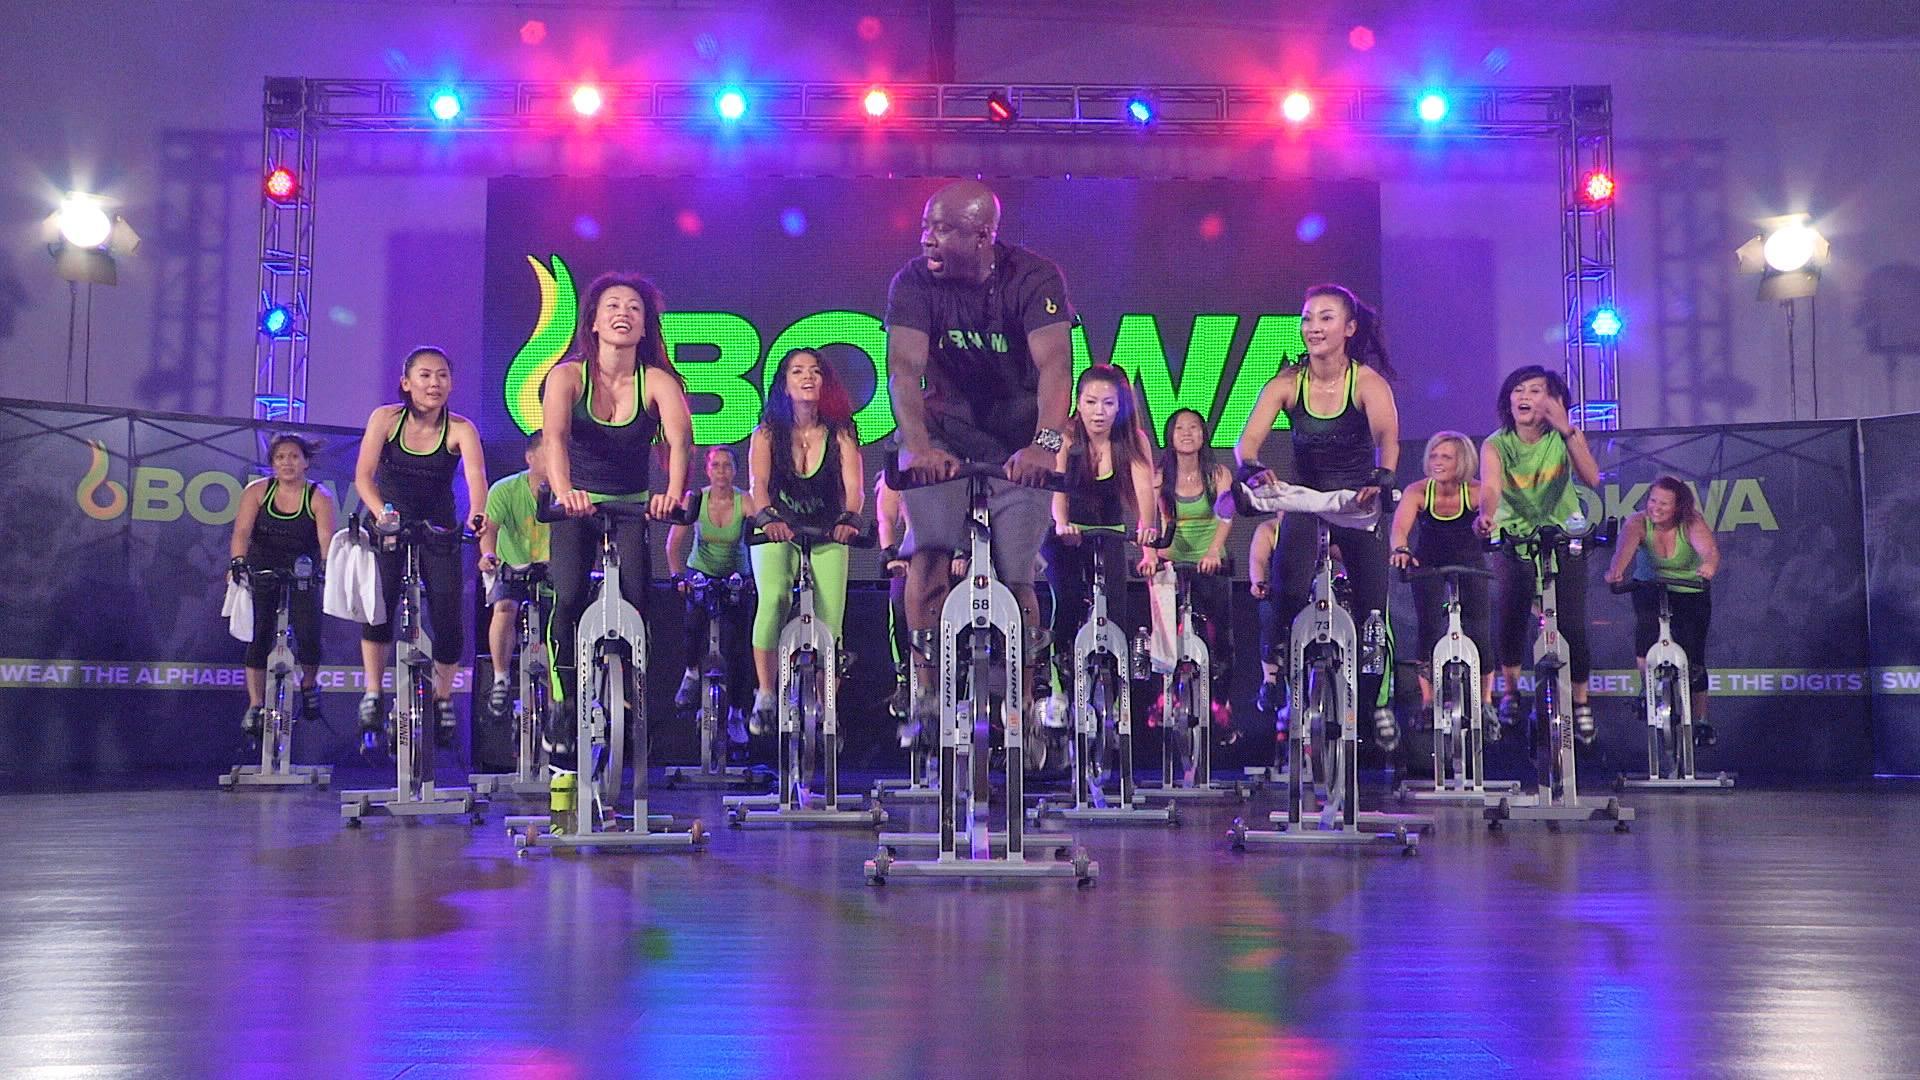 NEW!!!  BOKWA SAFARI CYCLING CLASSES